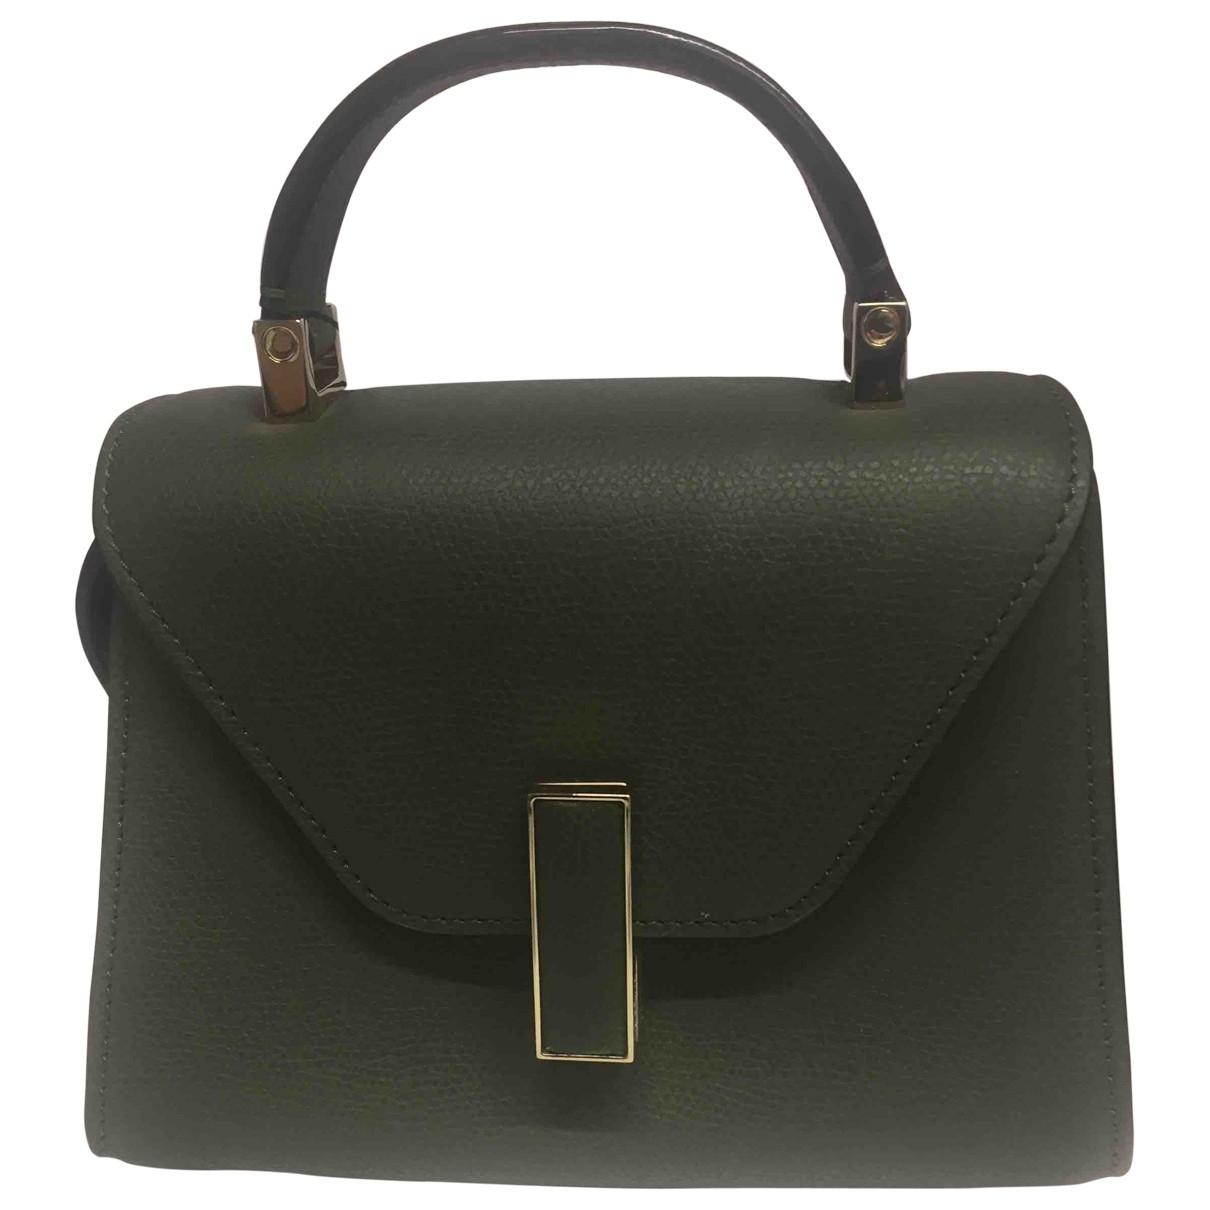 Valextra Iside Handtasche in  Gruen Leder